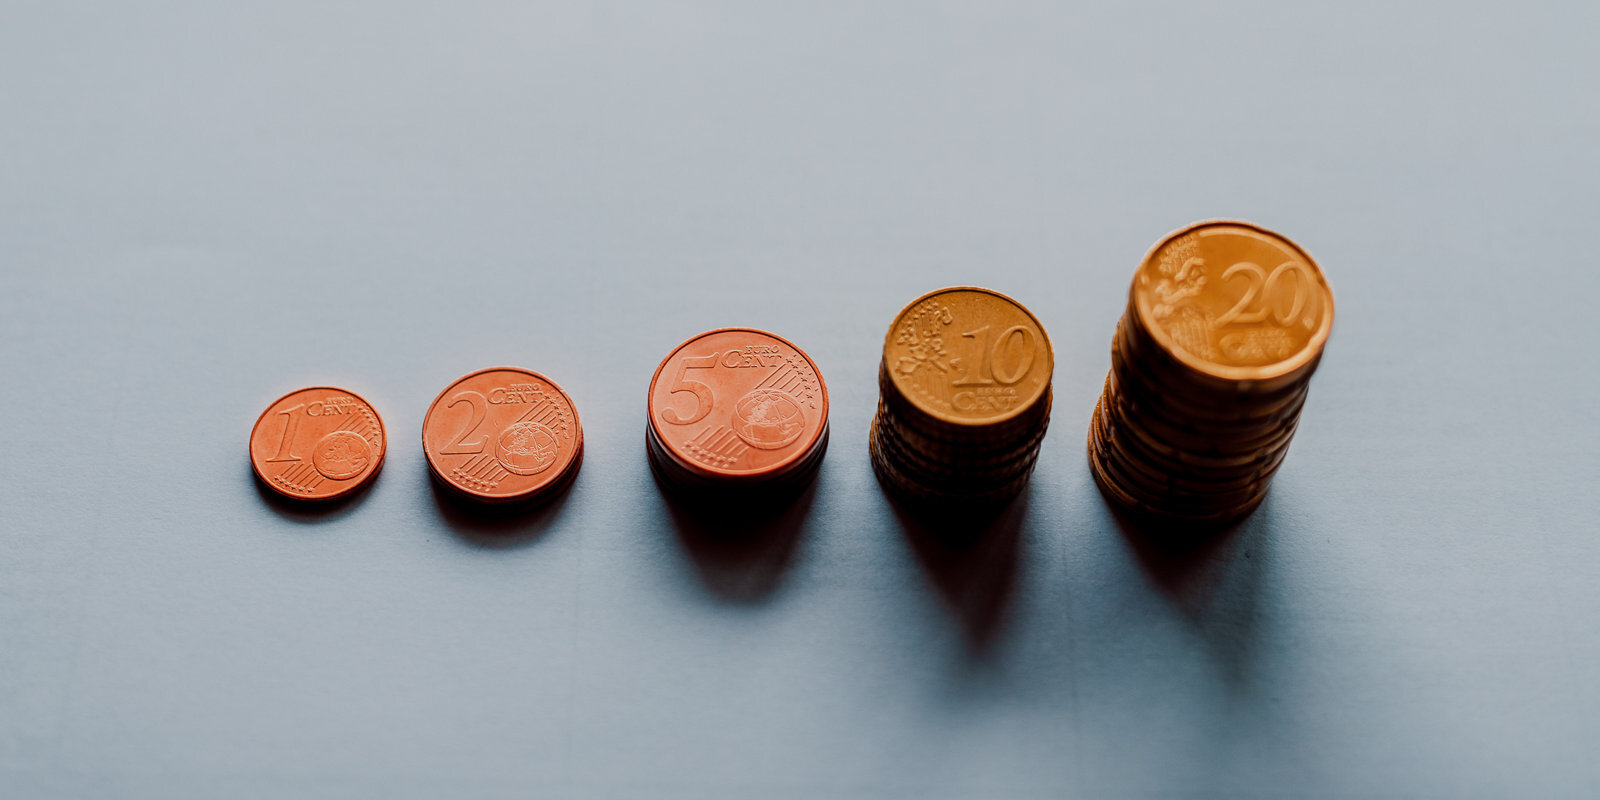 Депозит с минусом. Почему банки вводят комиссию за накопления на счетах?